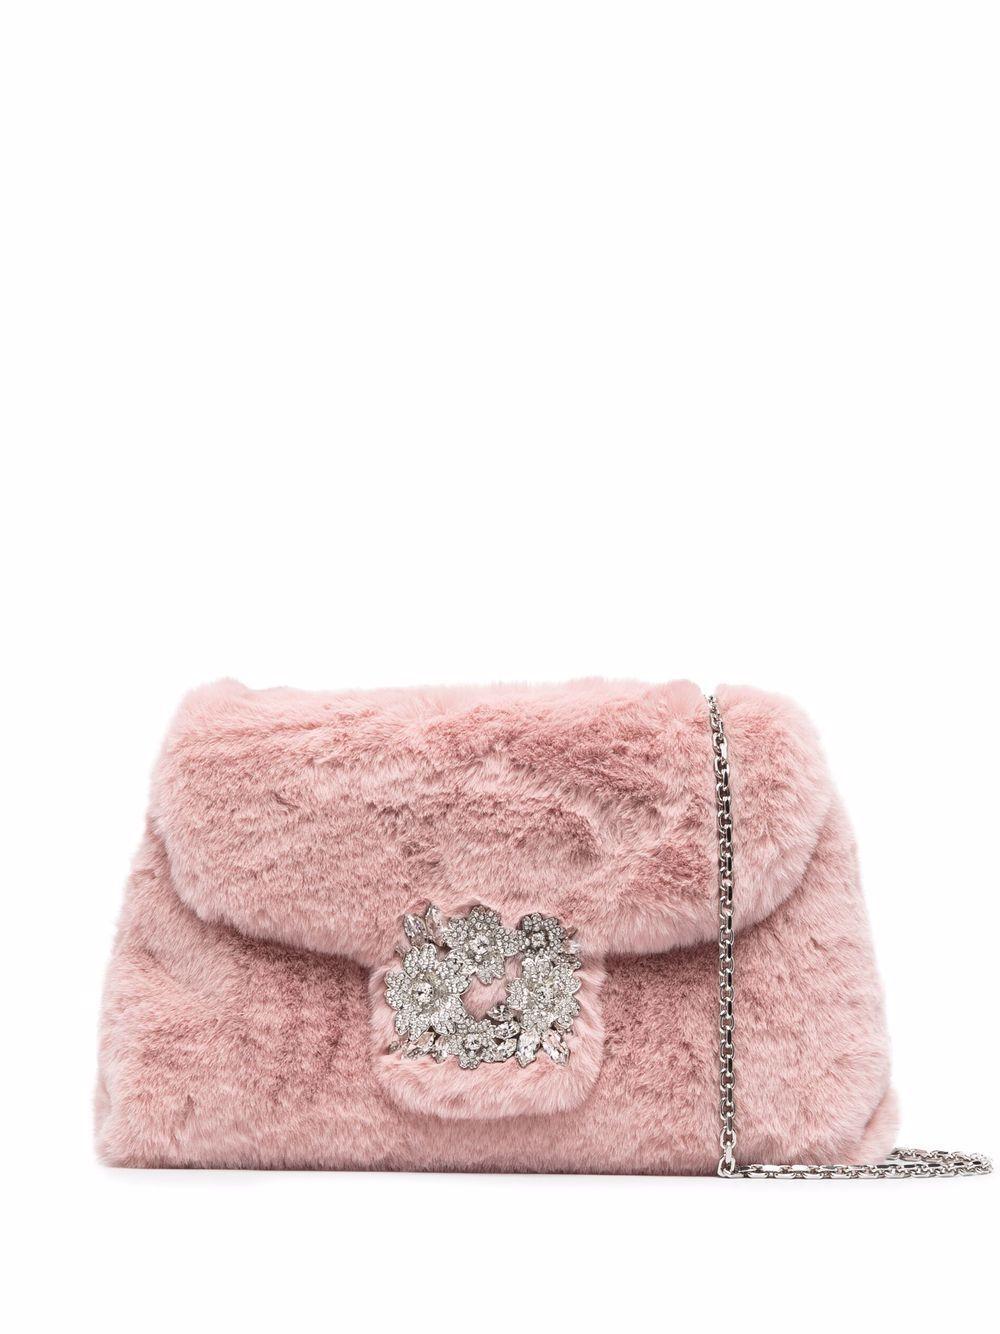 Roger vivier bags.. pink